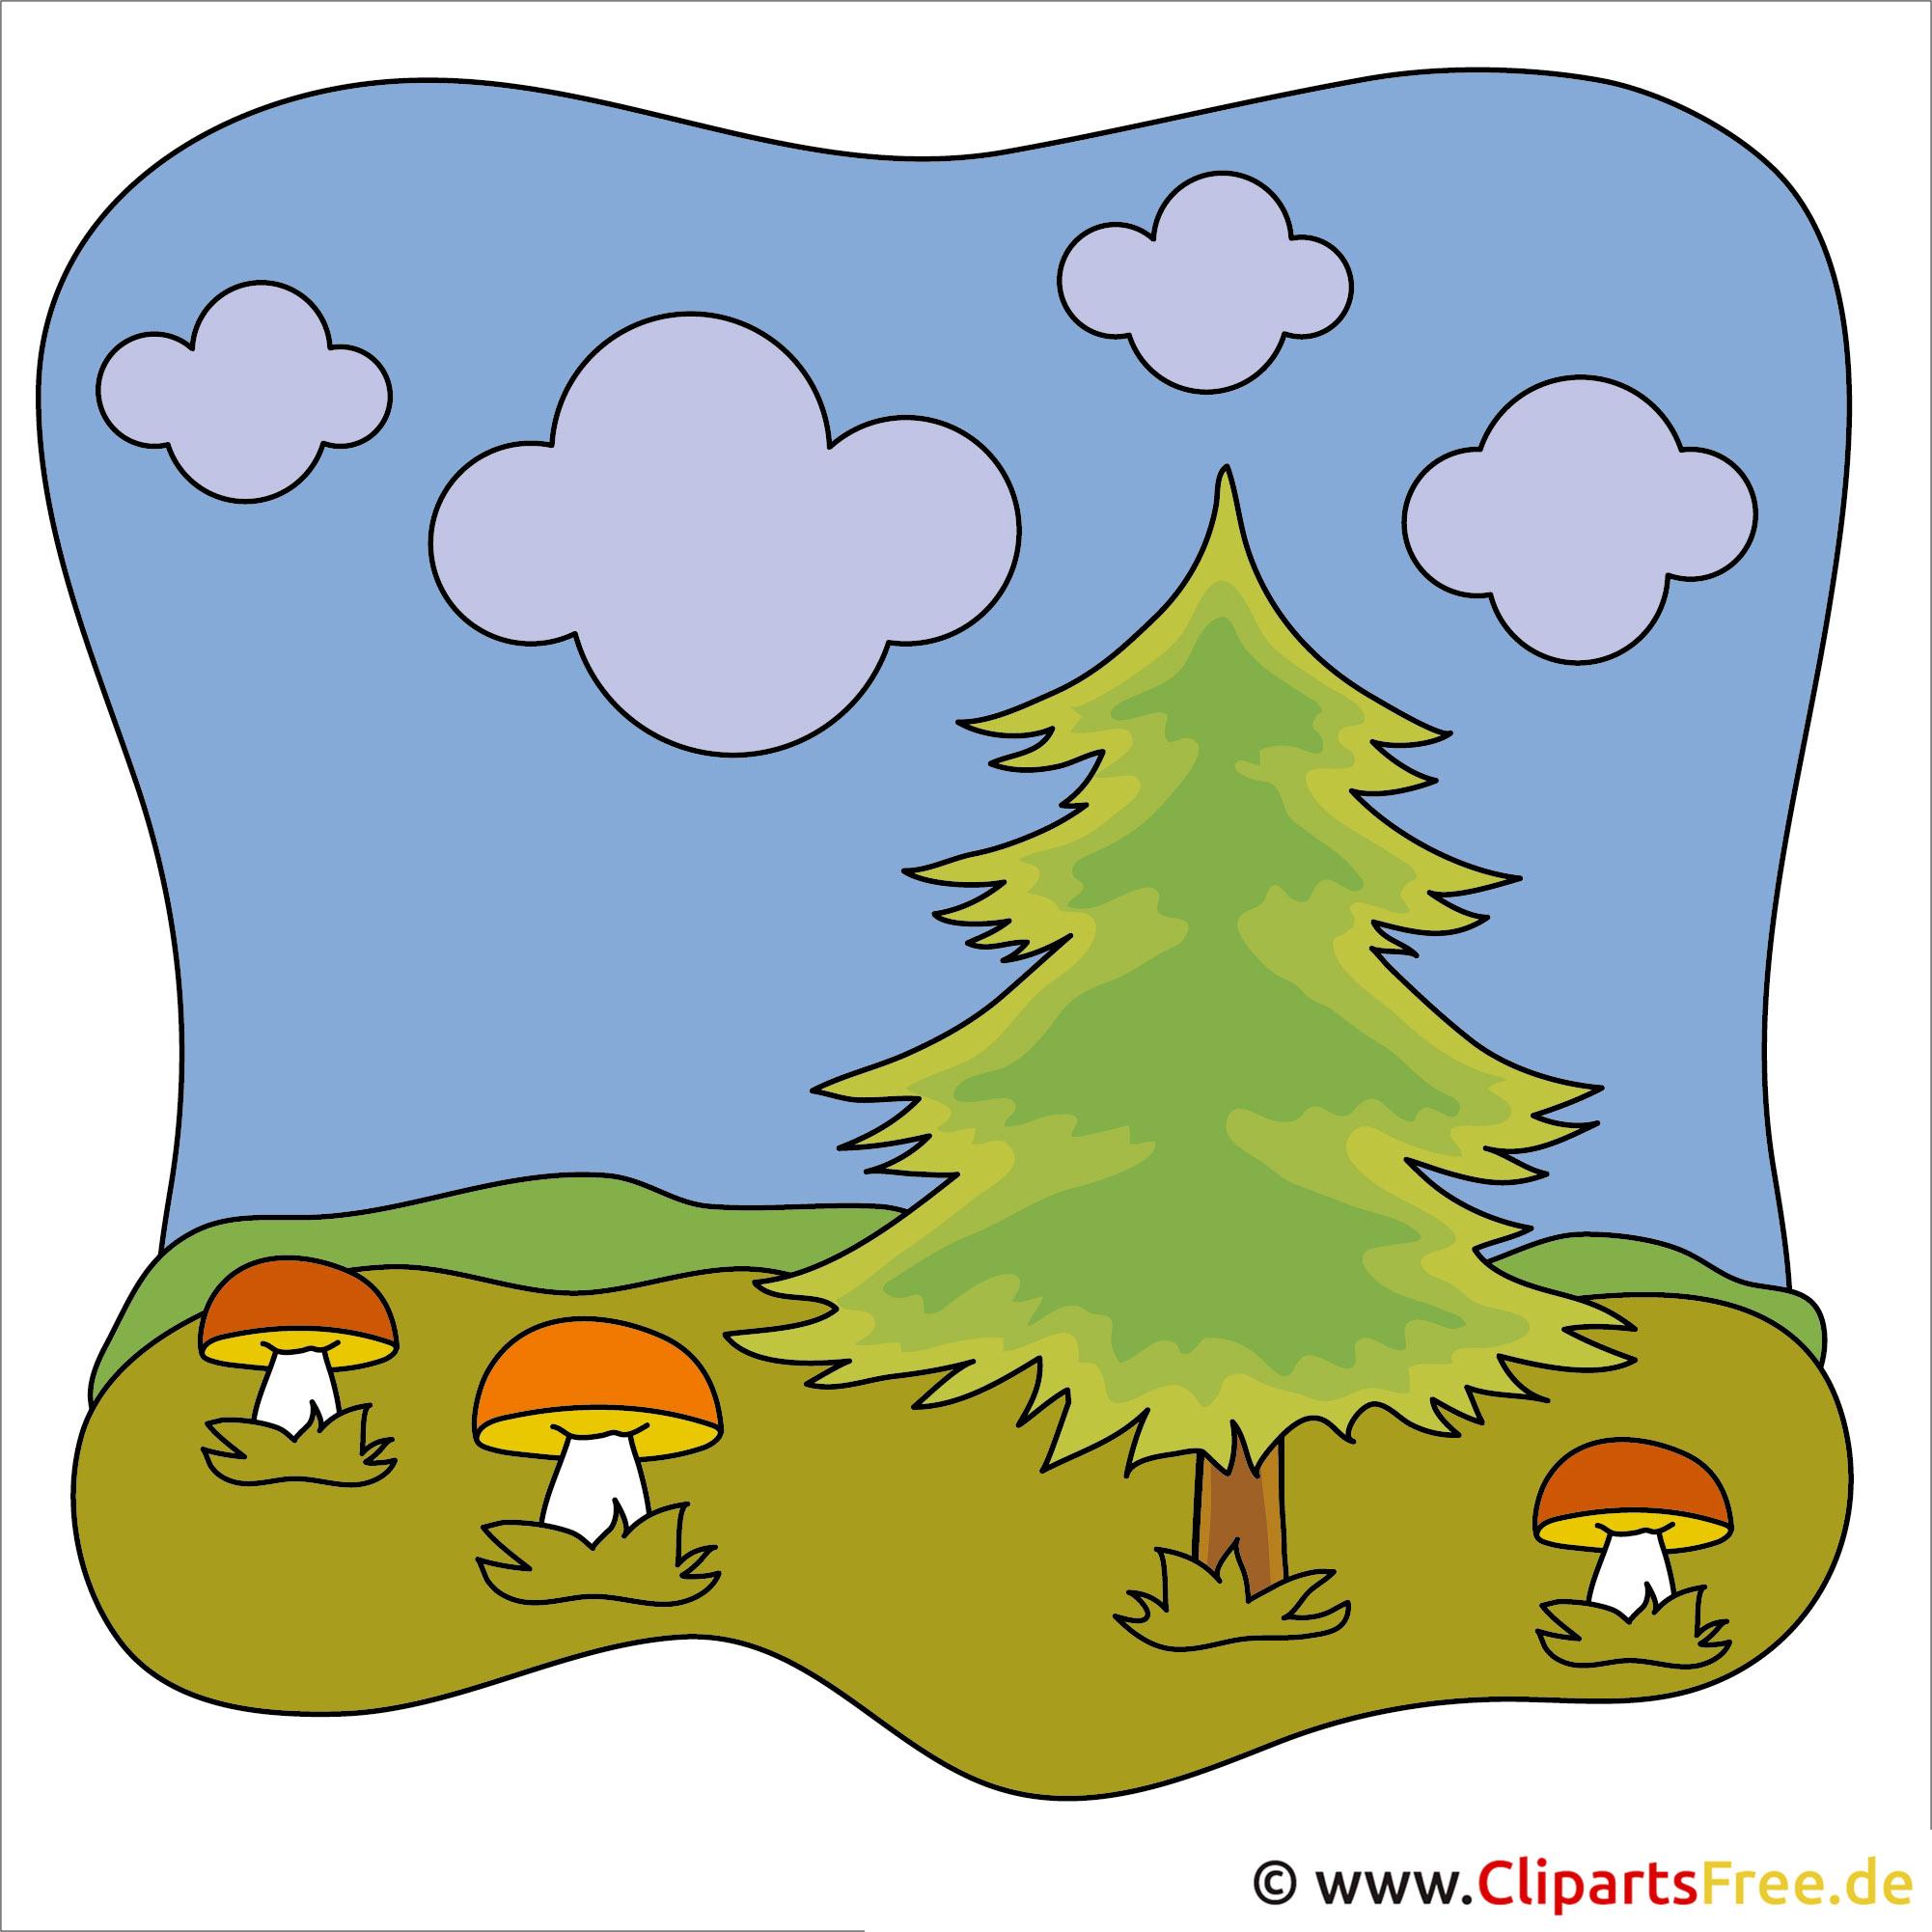 Pilze im Wald Clipart - Herbst Bilder kostenlos